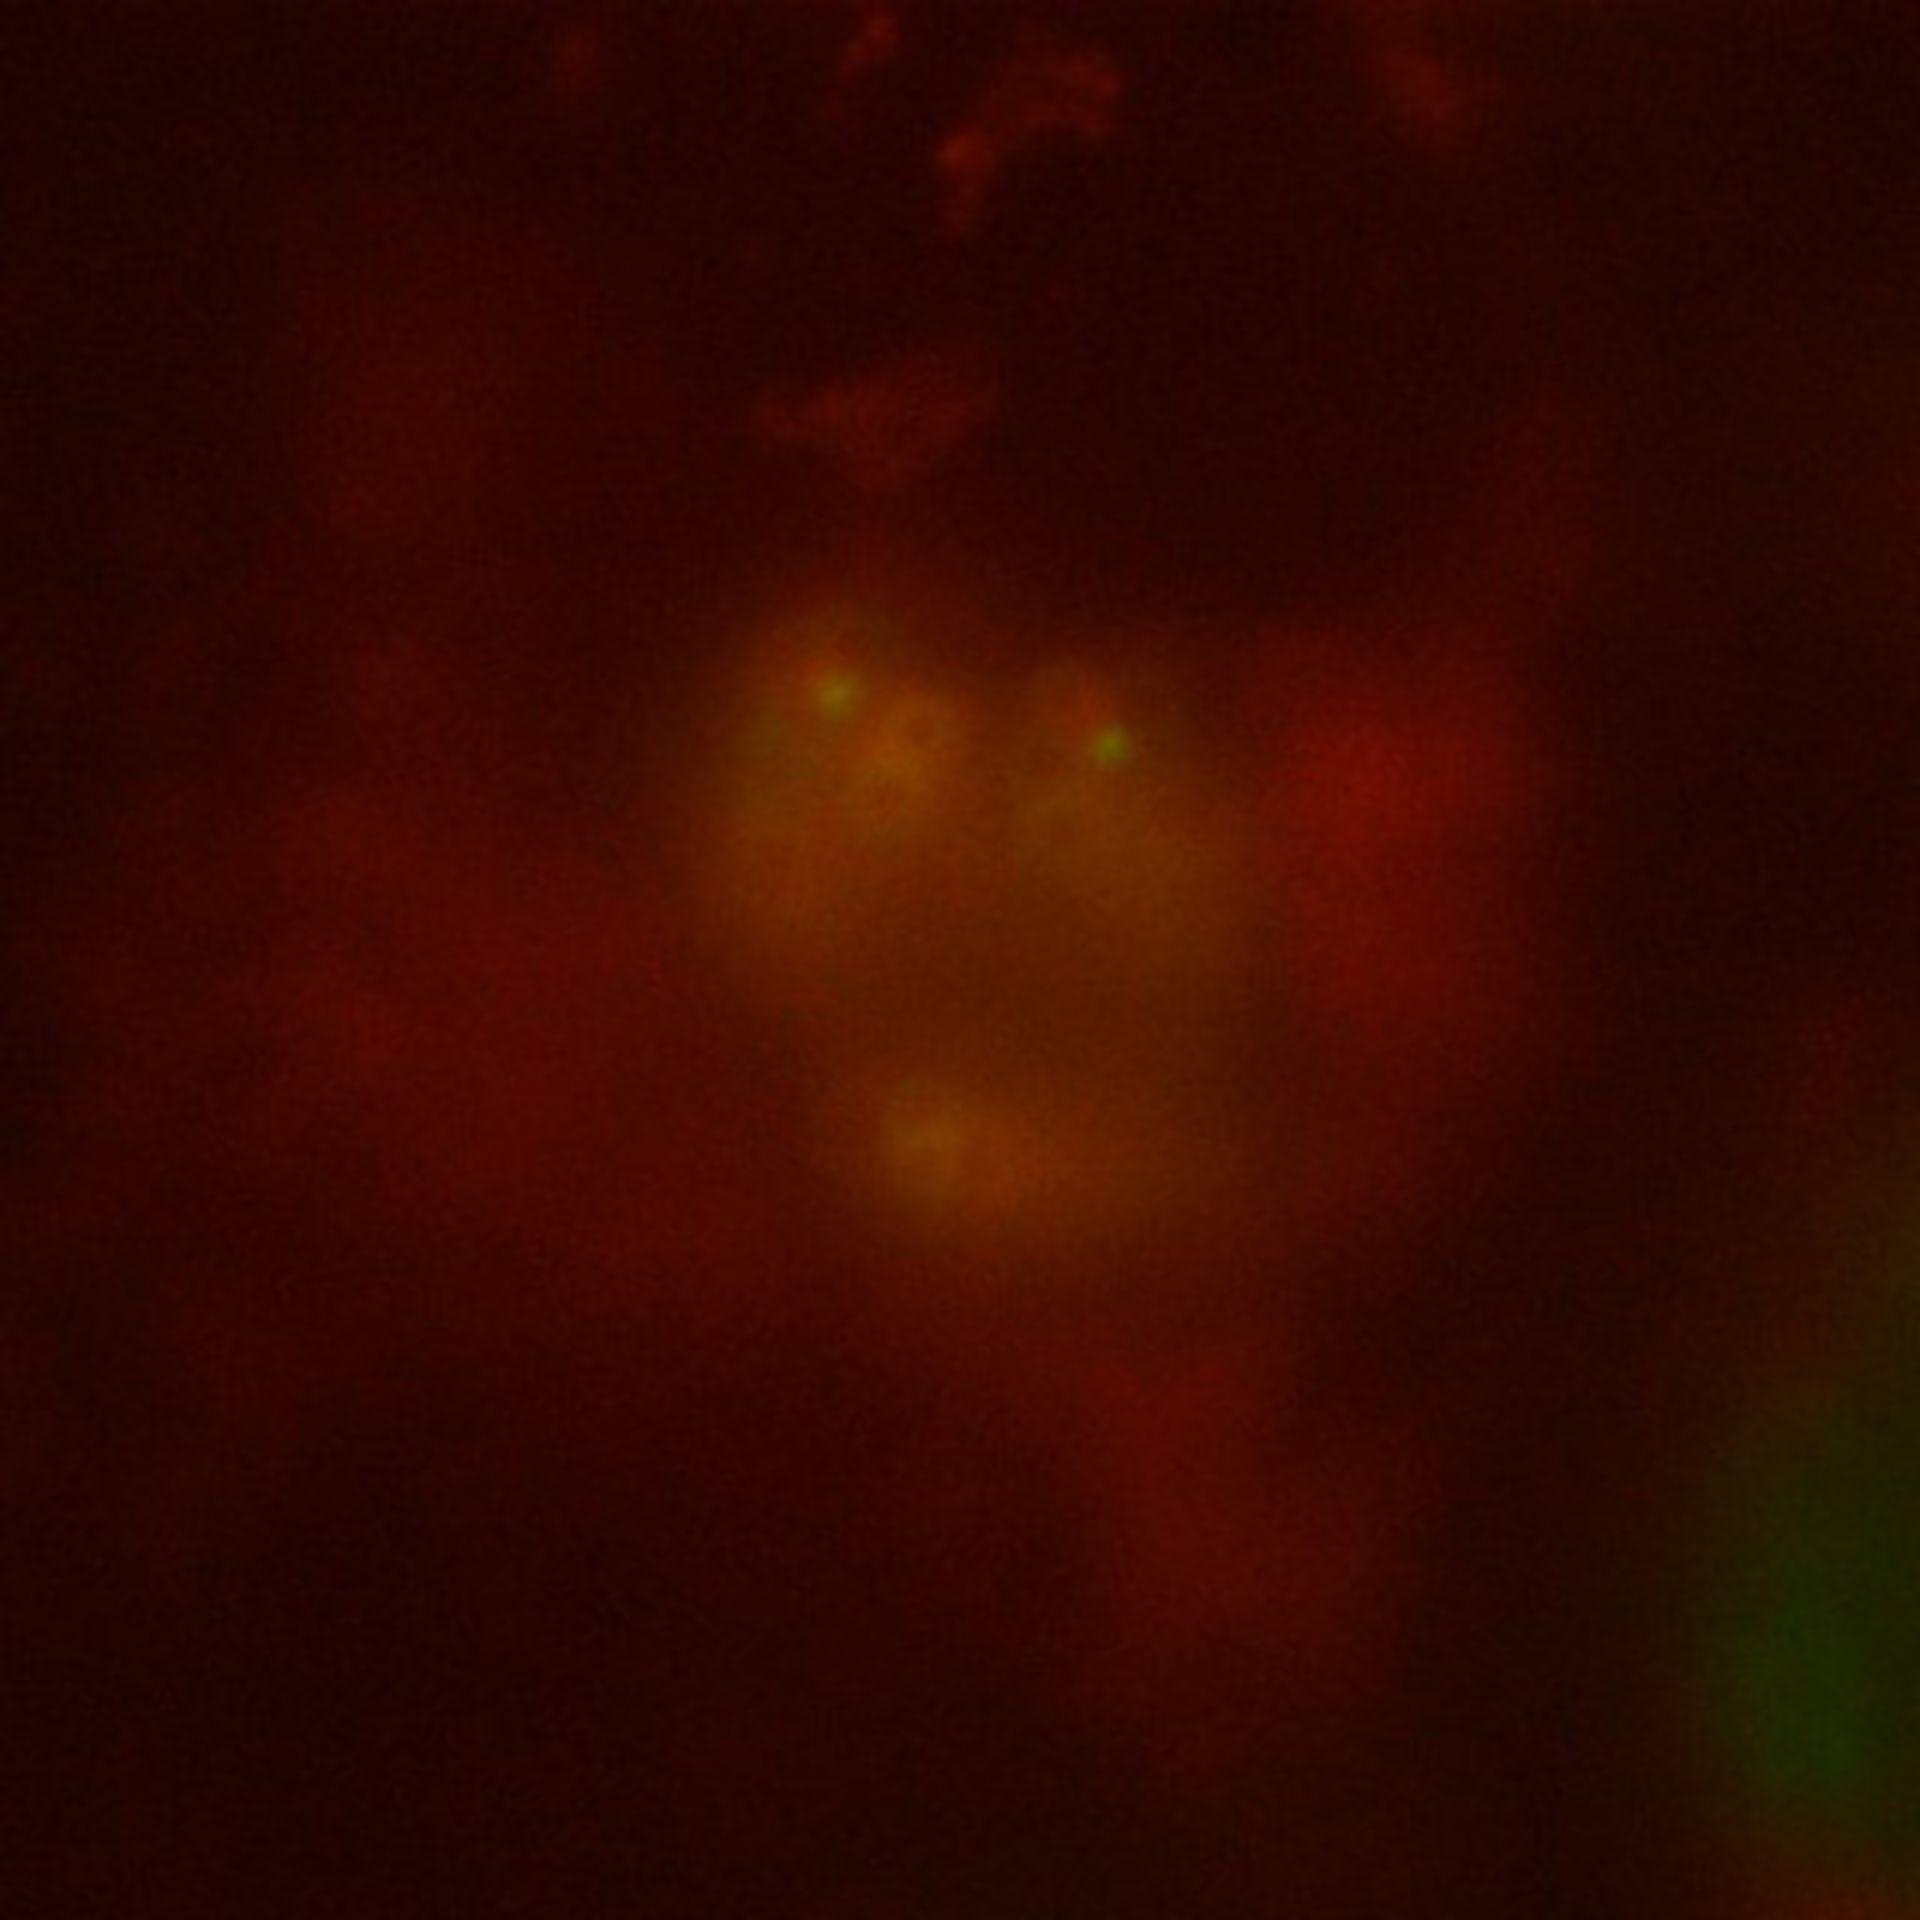 Toxoplasma gondii RH (Conoid) - CIL:10491